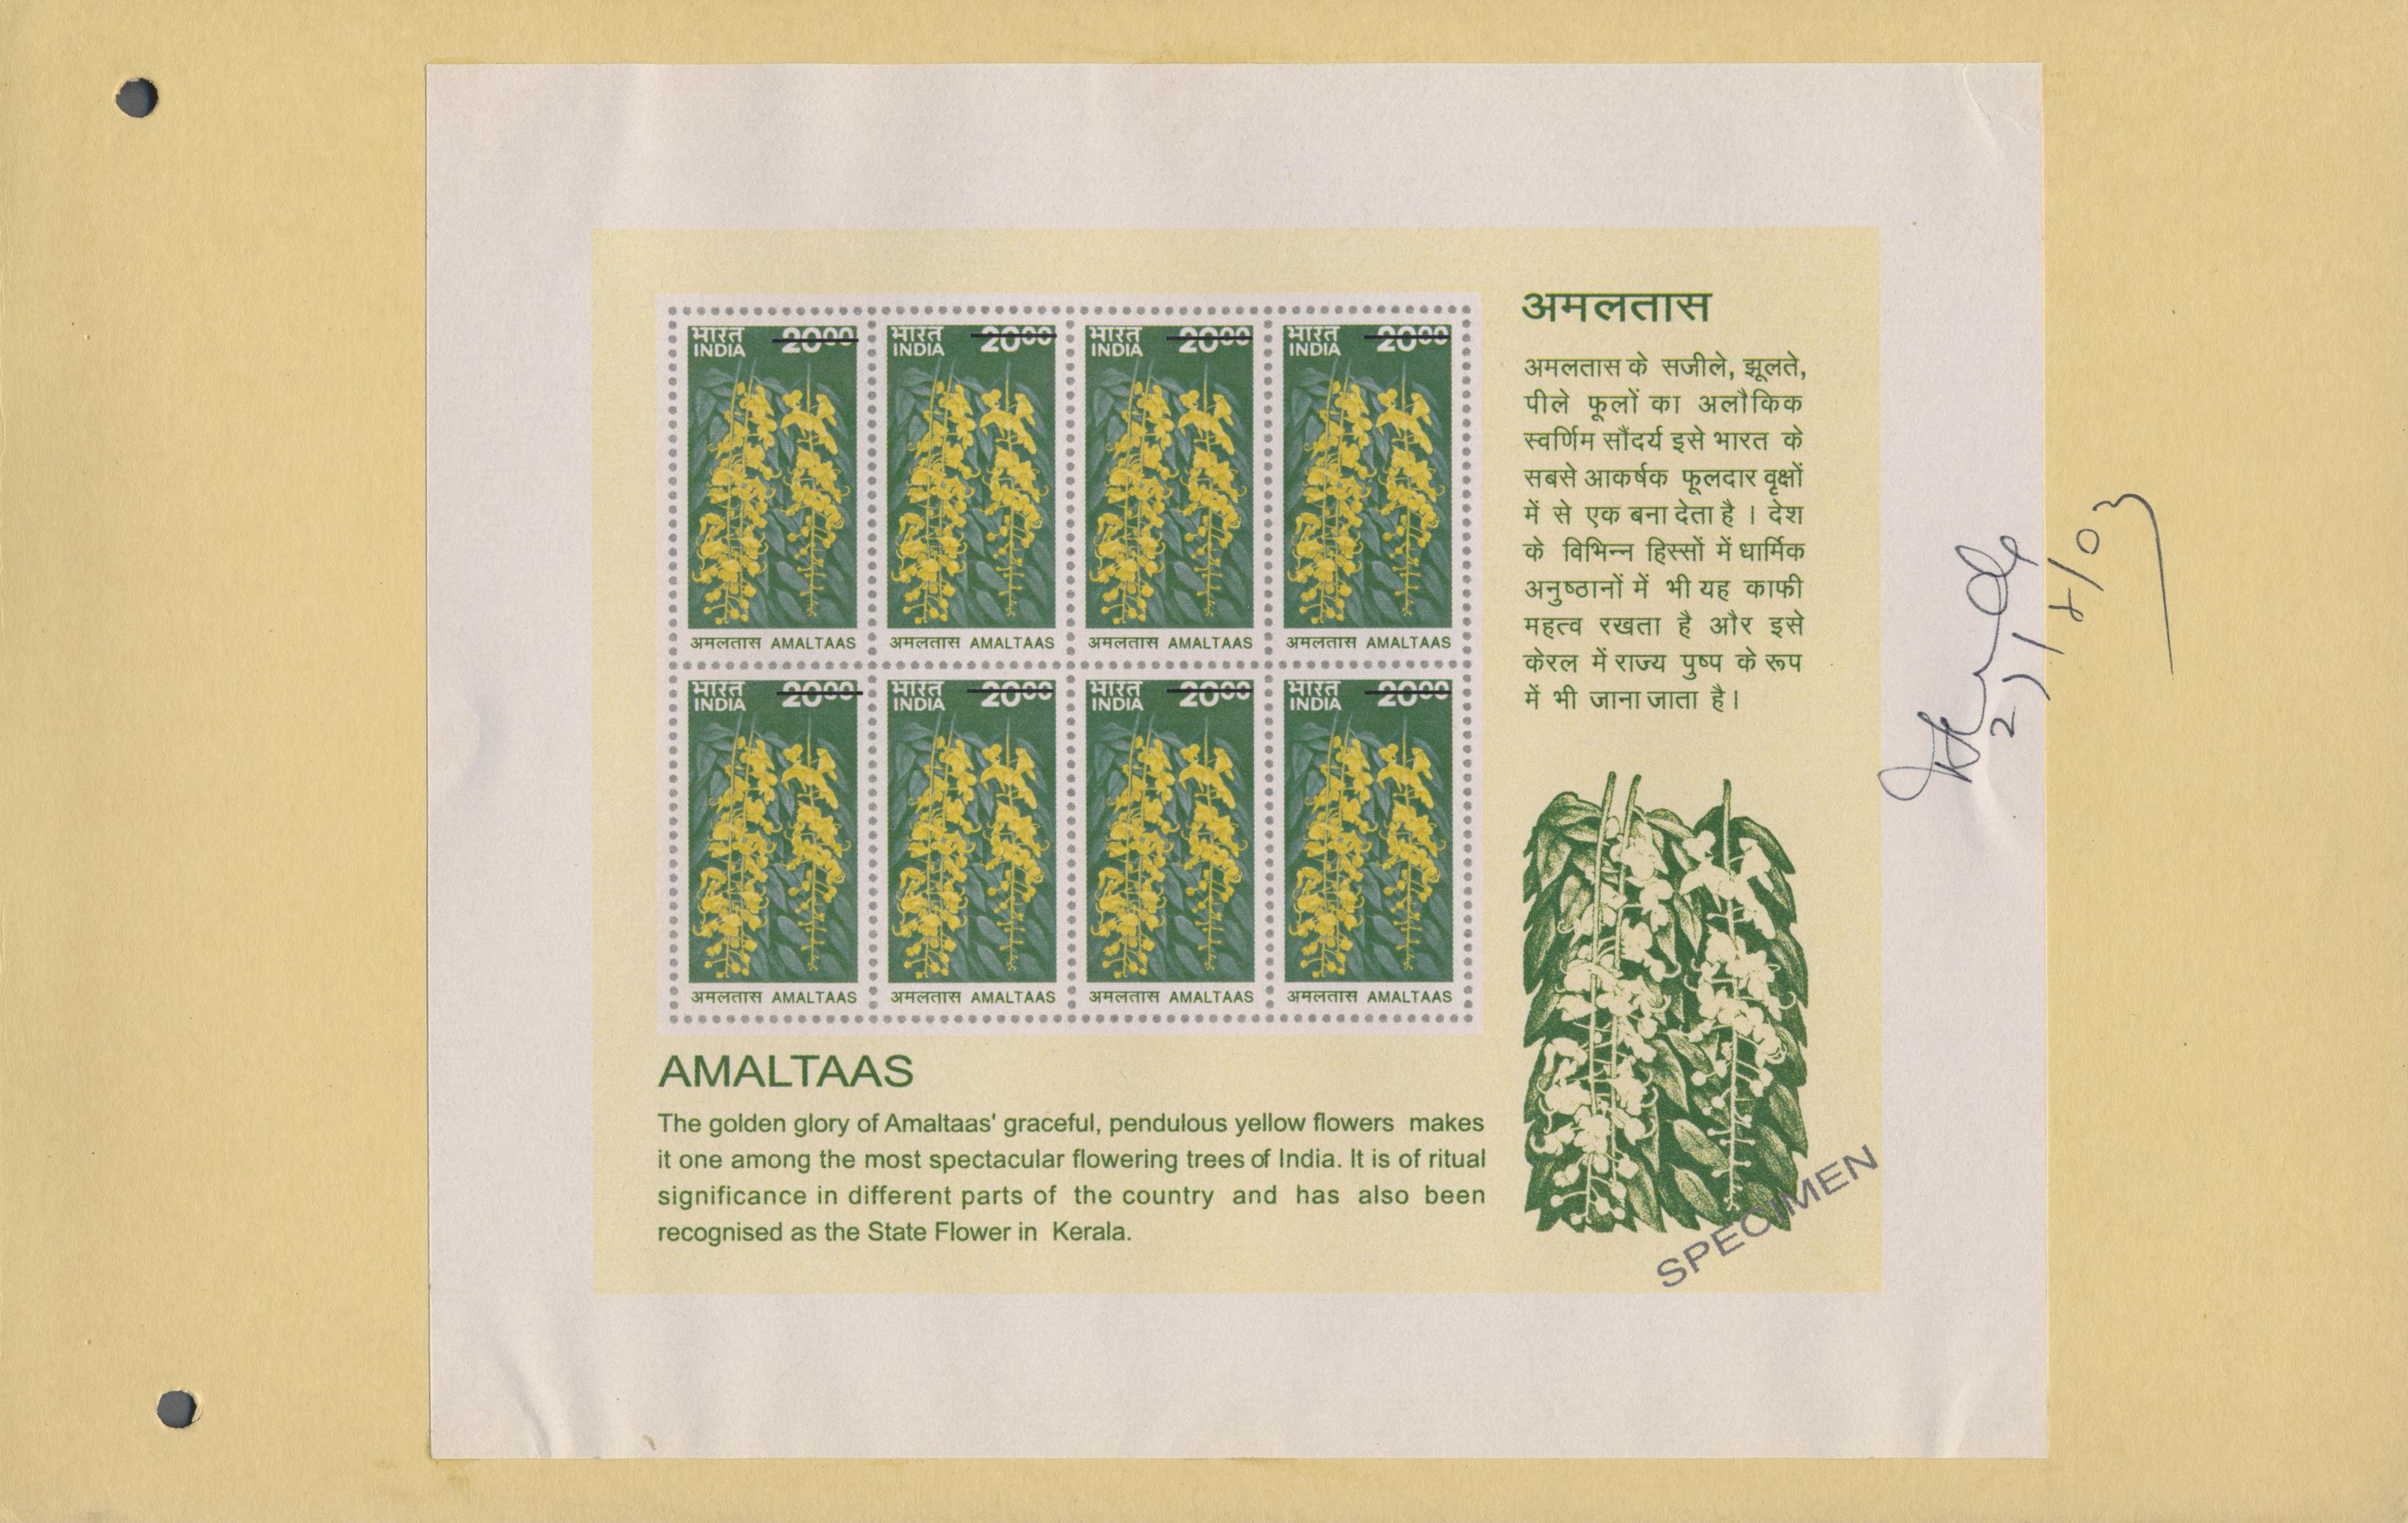 Lot 20682 - Thematik: Flora, Botanik / flora, botany, bloom  -  Auktionshaus Christoph Gärtner GmbH & Co. KG Sale #47 Collections: Overseas, Thematics, Europe